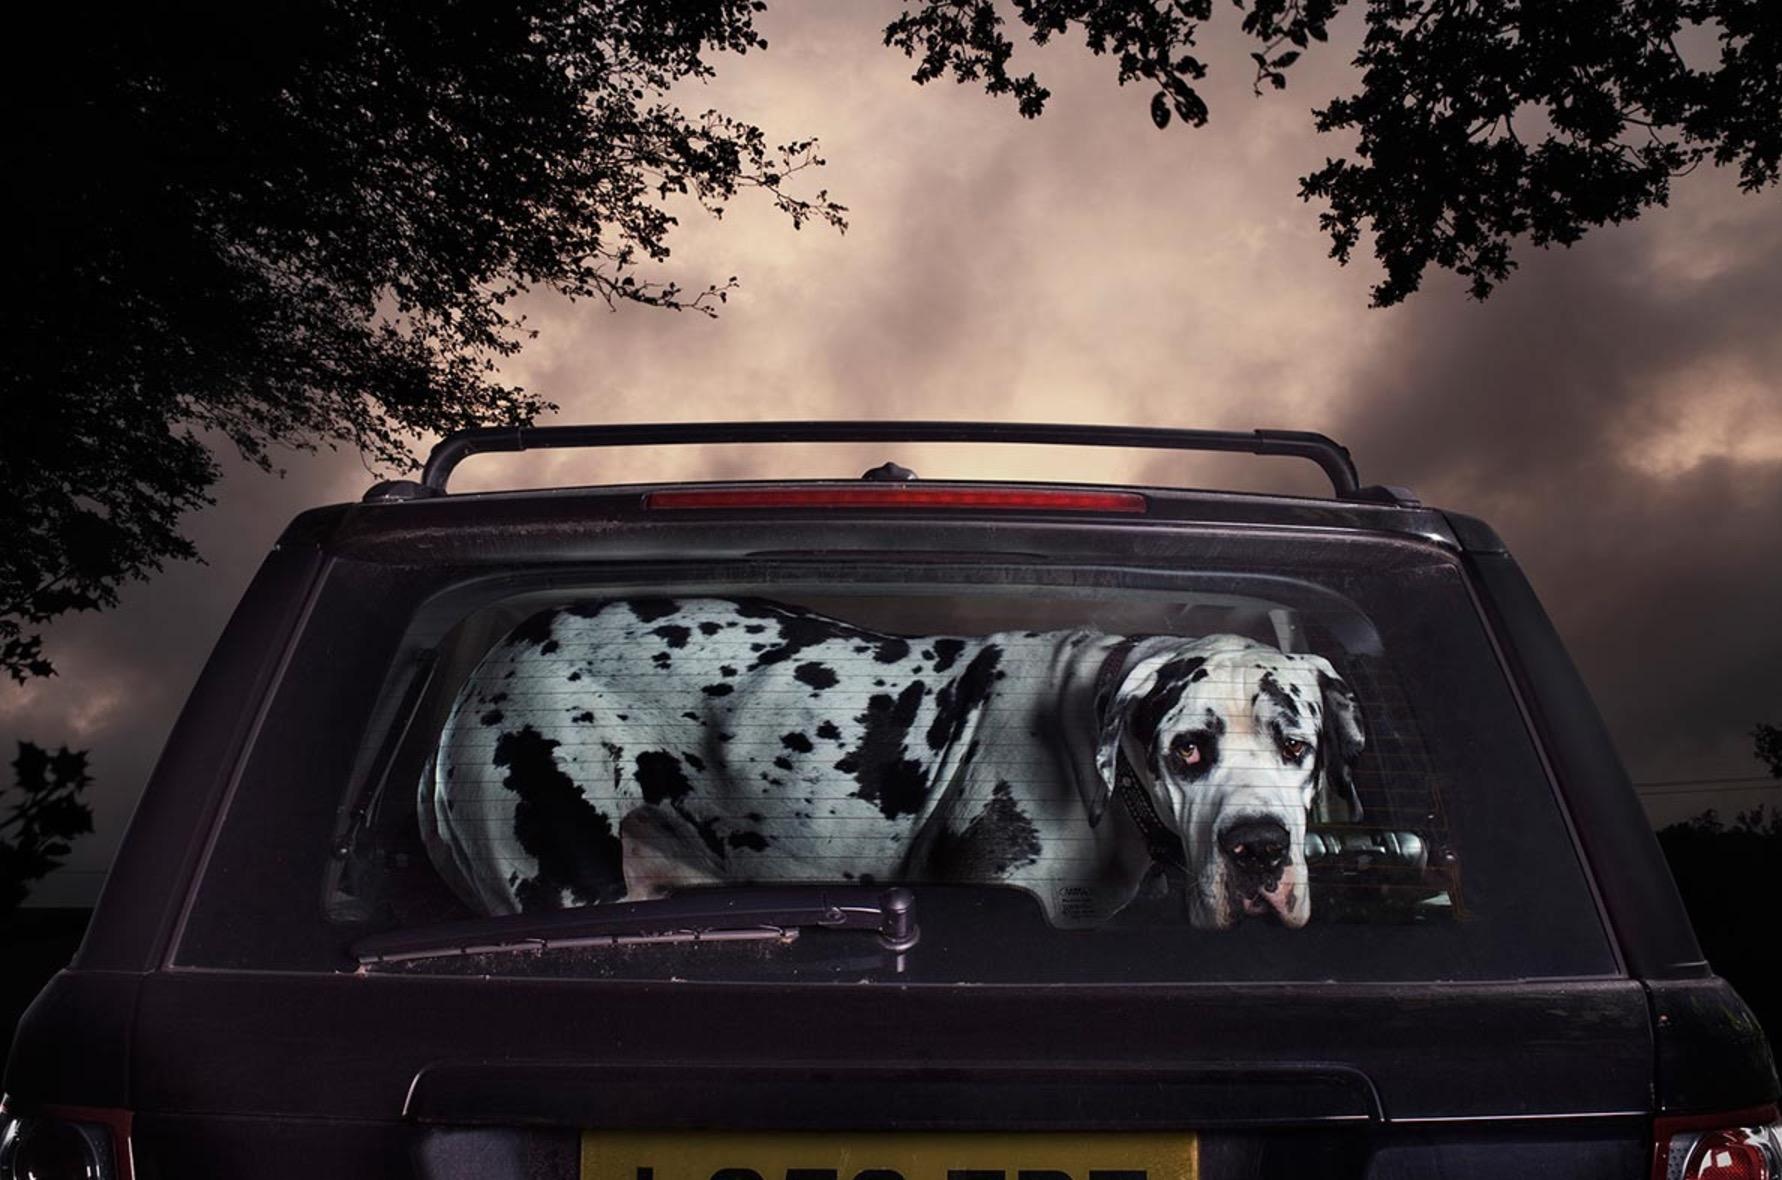 Martin-Usborne-photographe-chiens-voitures-2